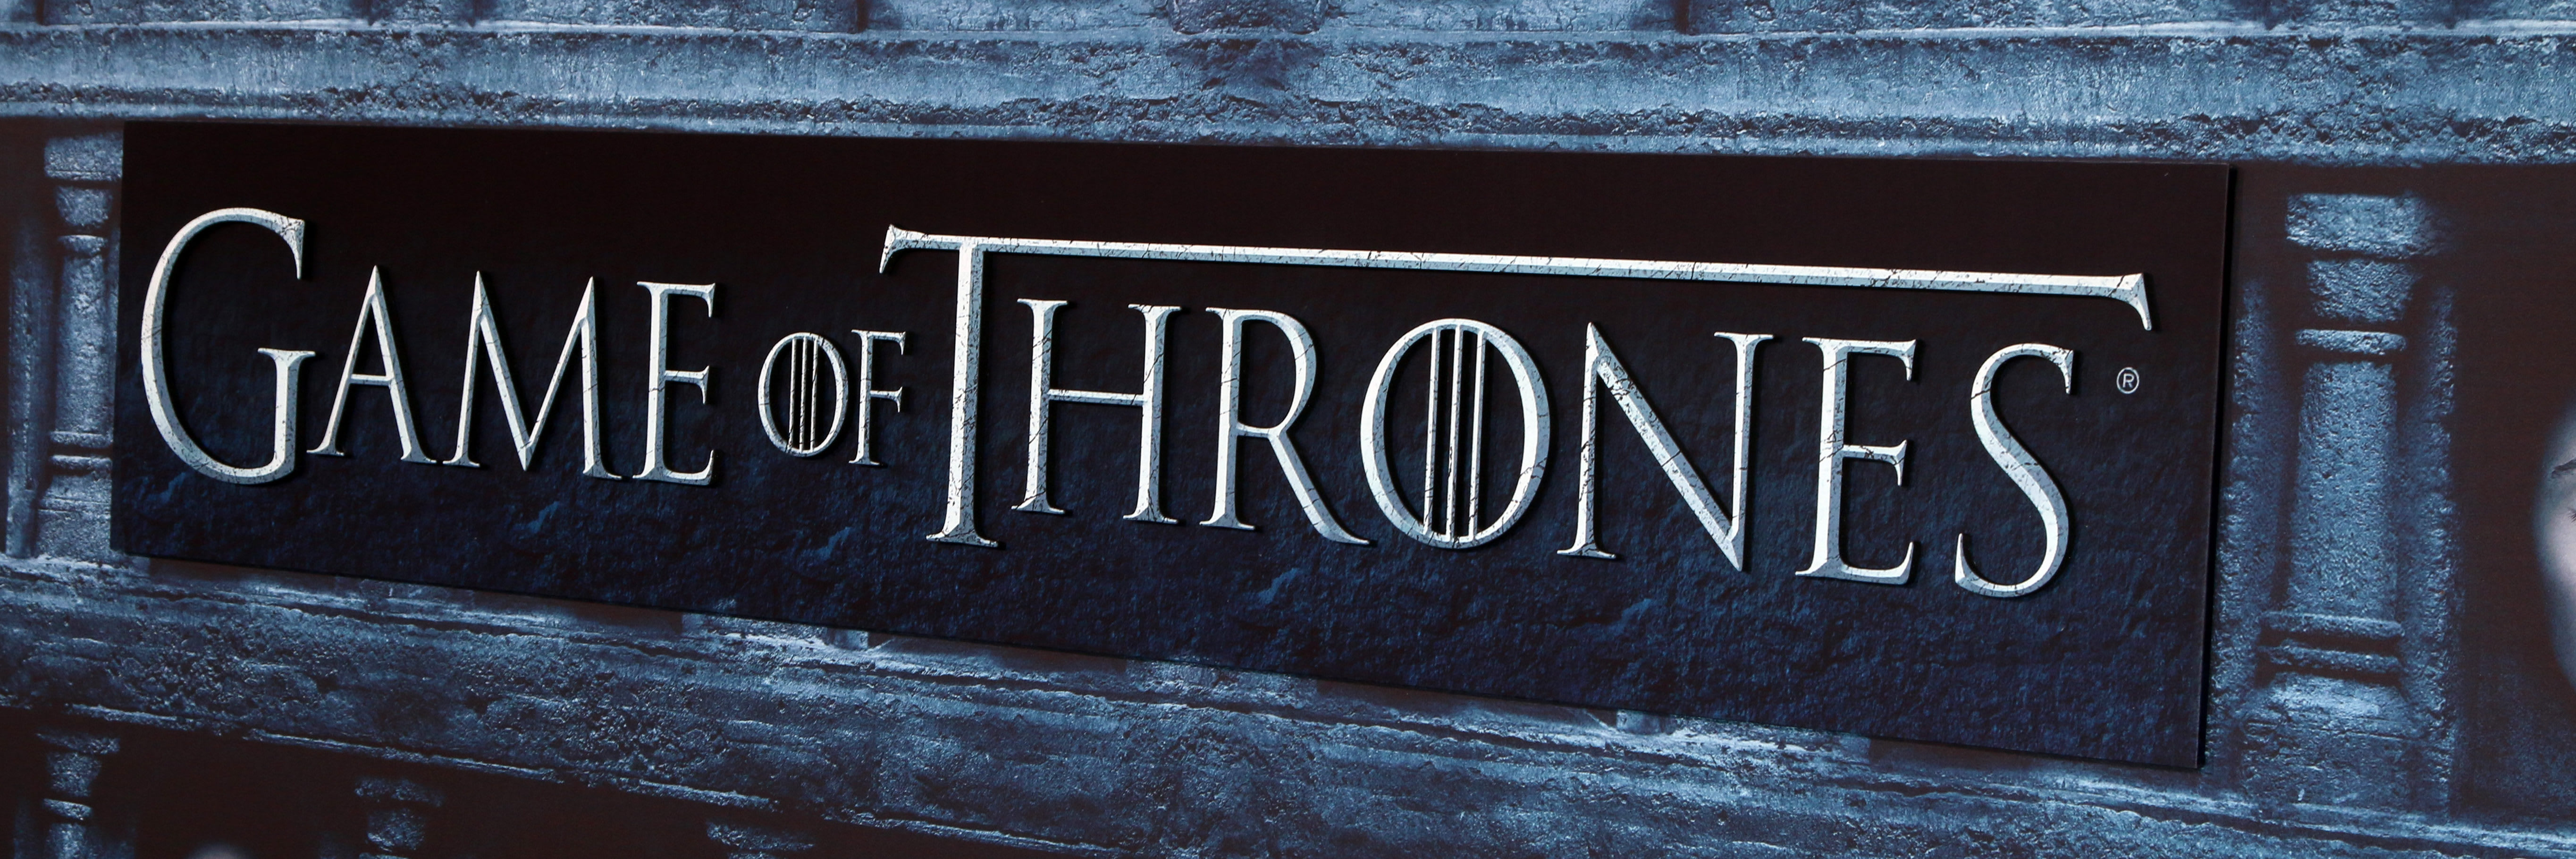 Game of Thrones data analysis